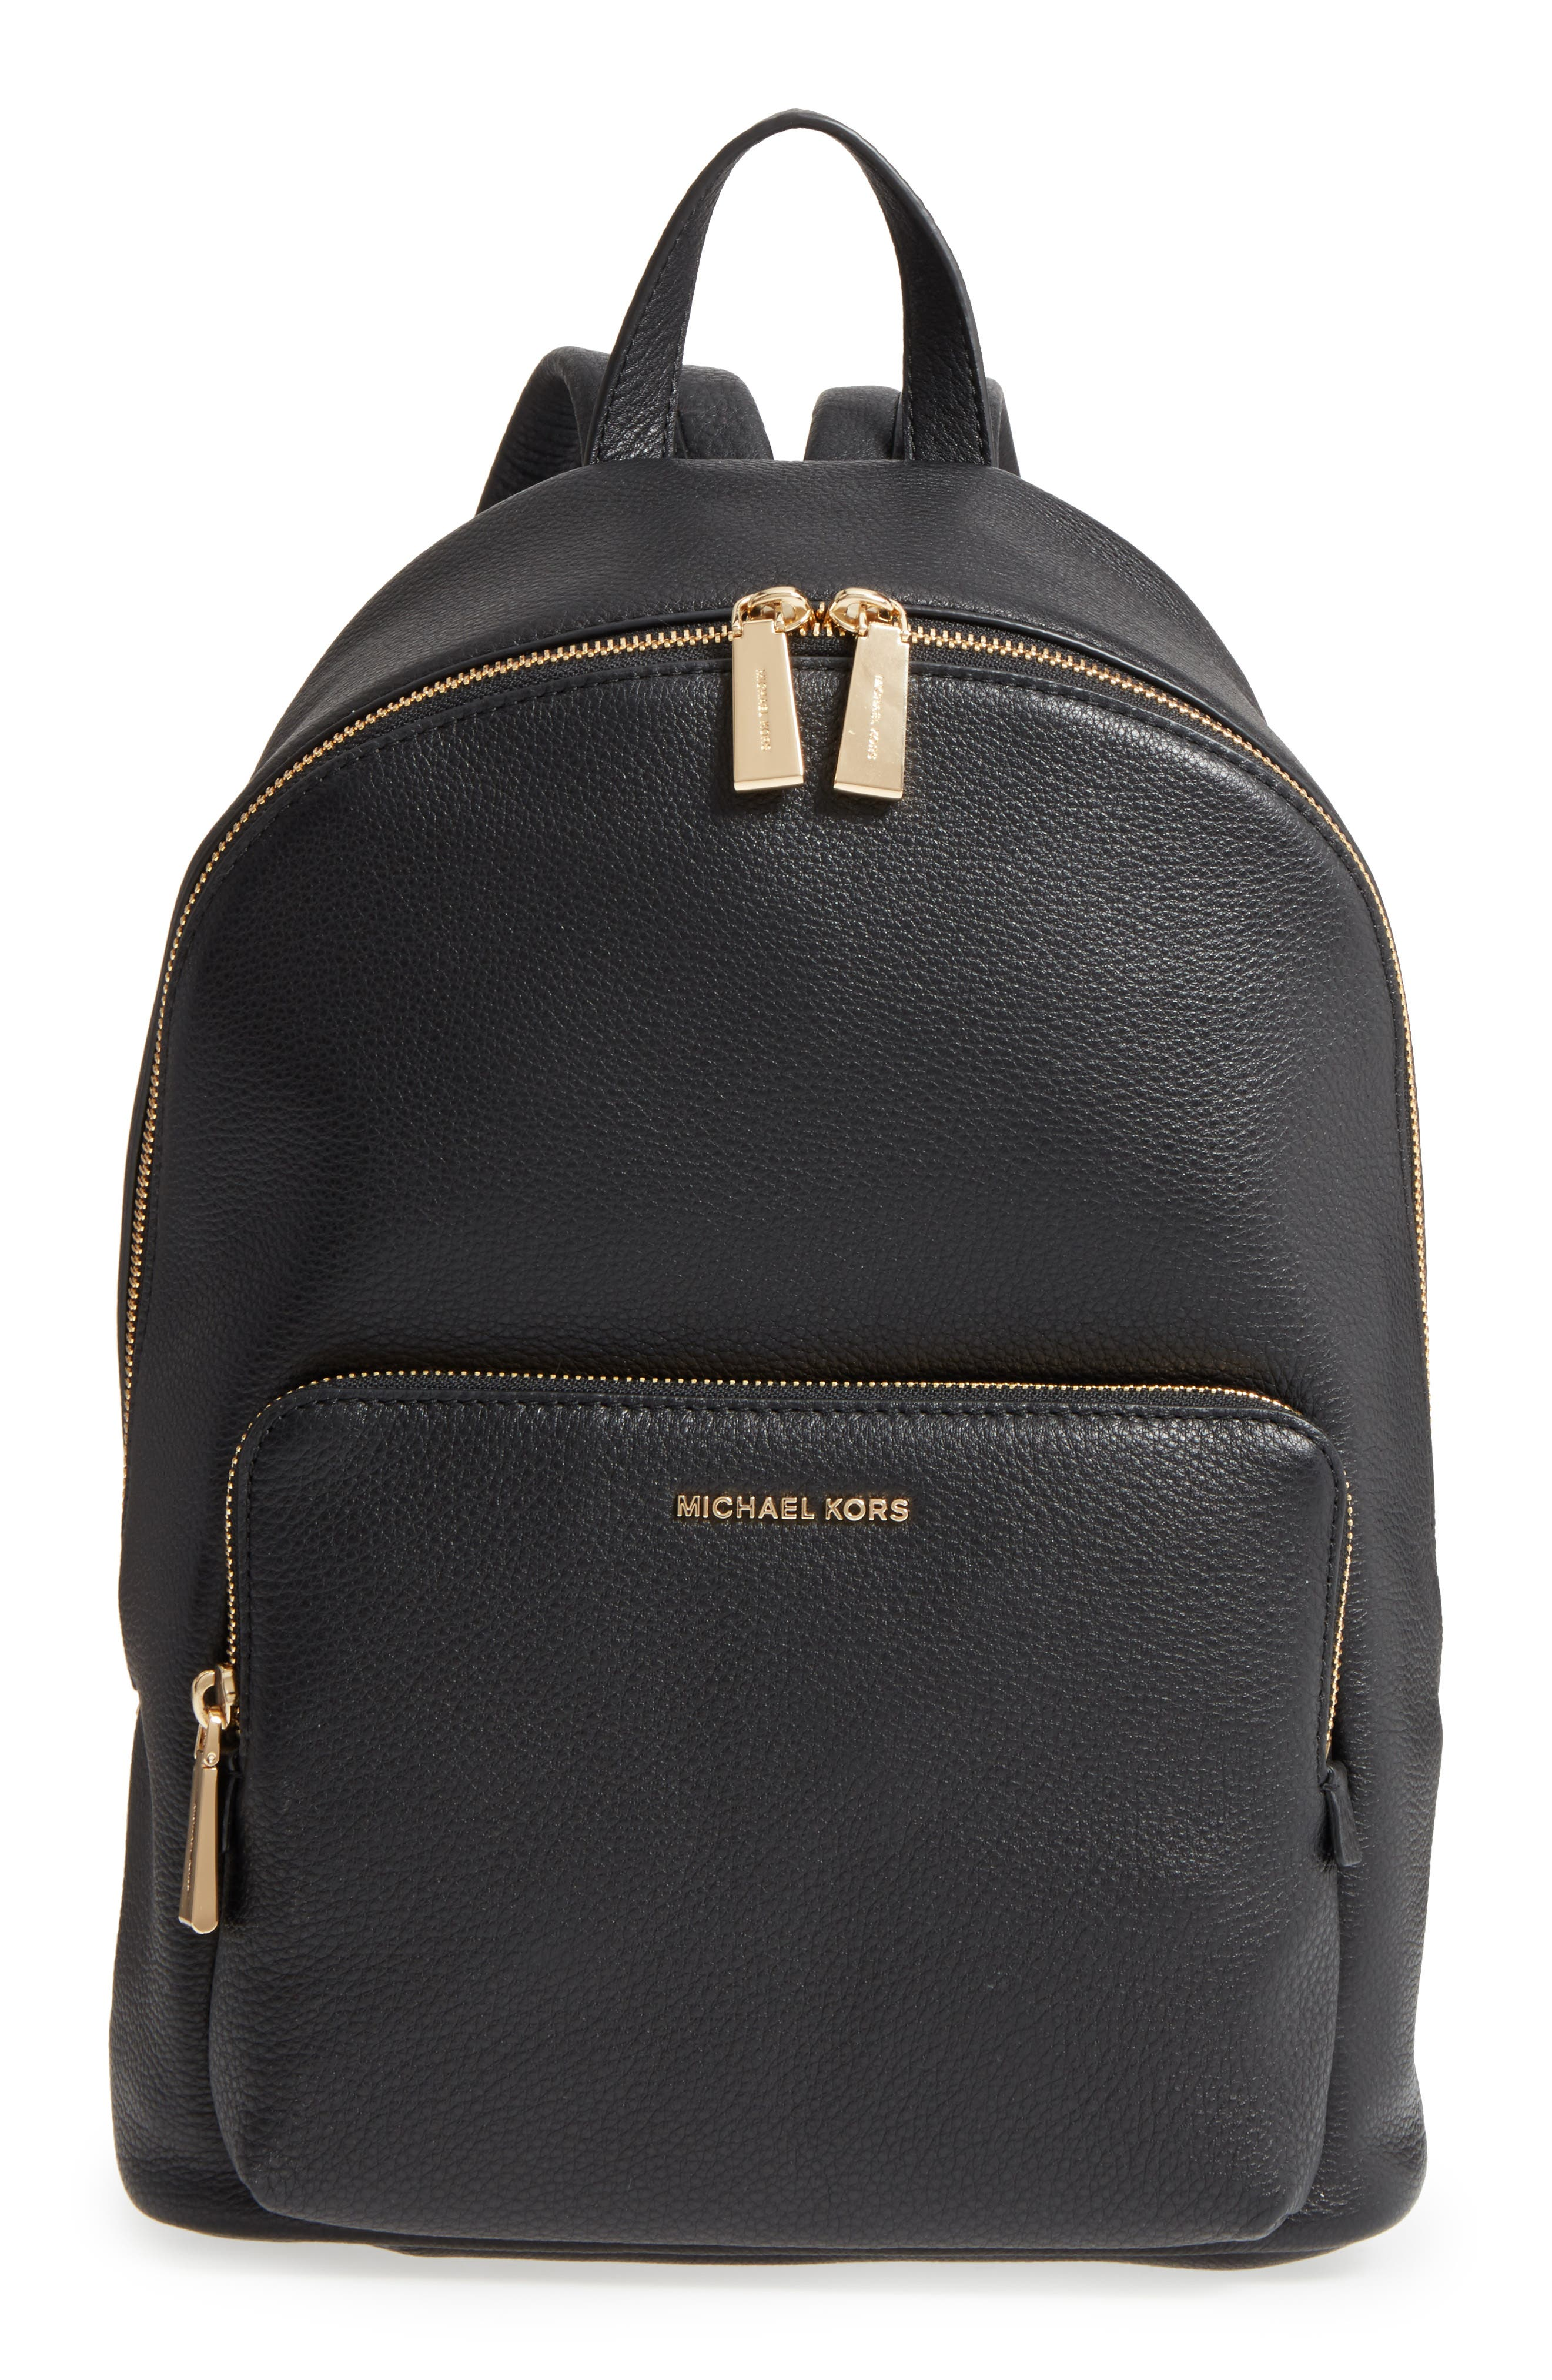 michael kors black nylon backpack mk bags amazon uk